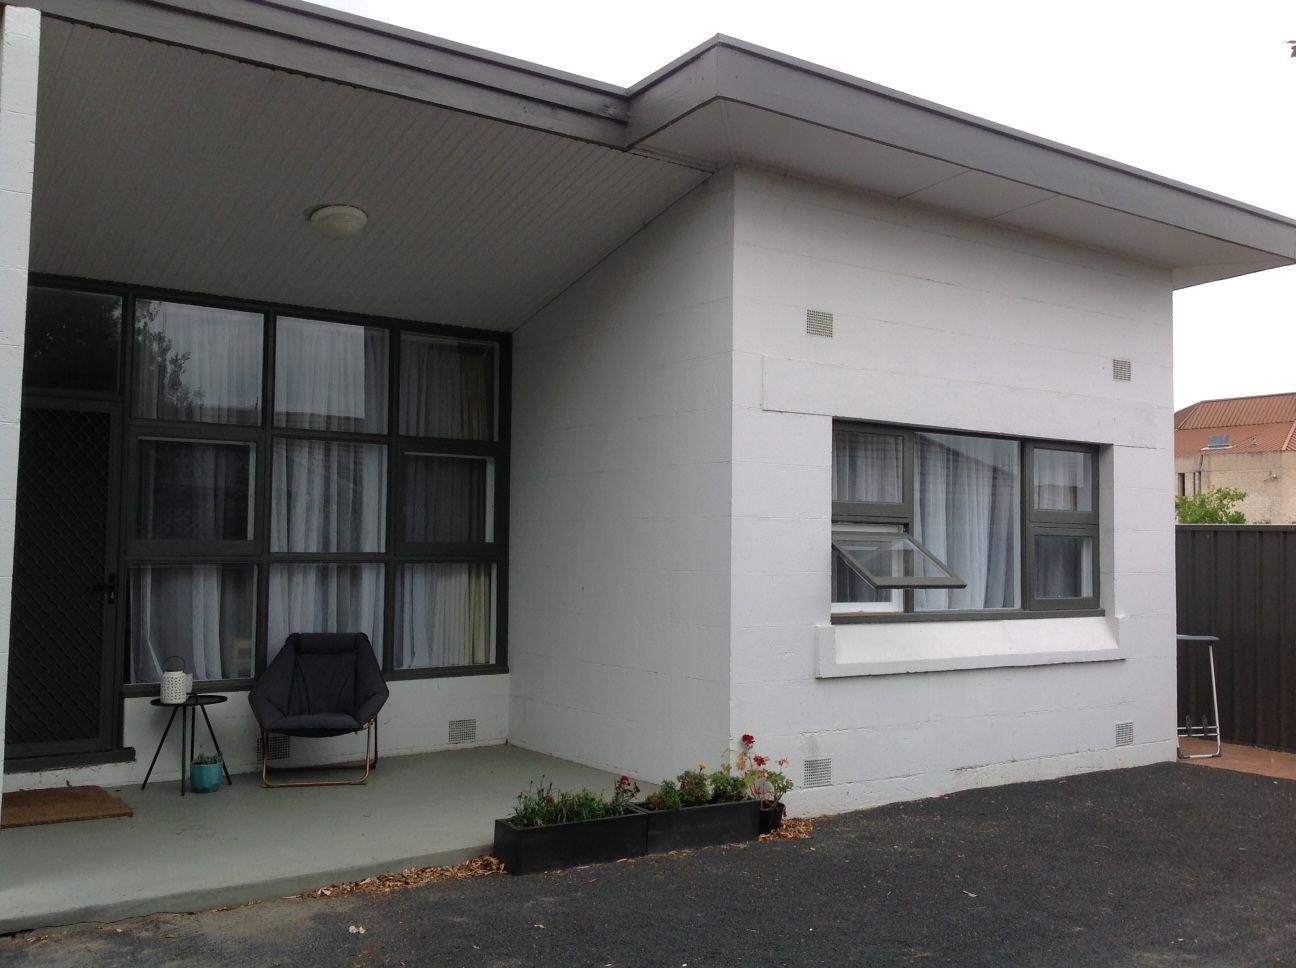 4/3 Kilsby Place, Mount Gambier SA 5290, Image 0